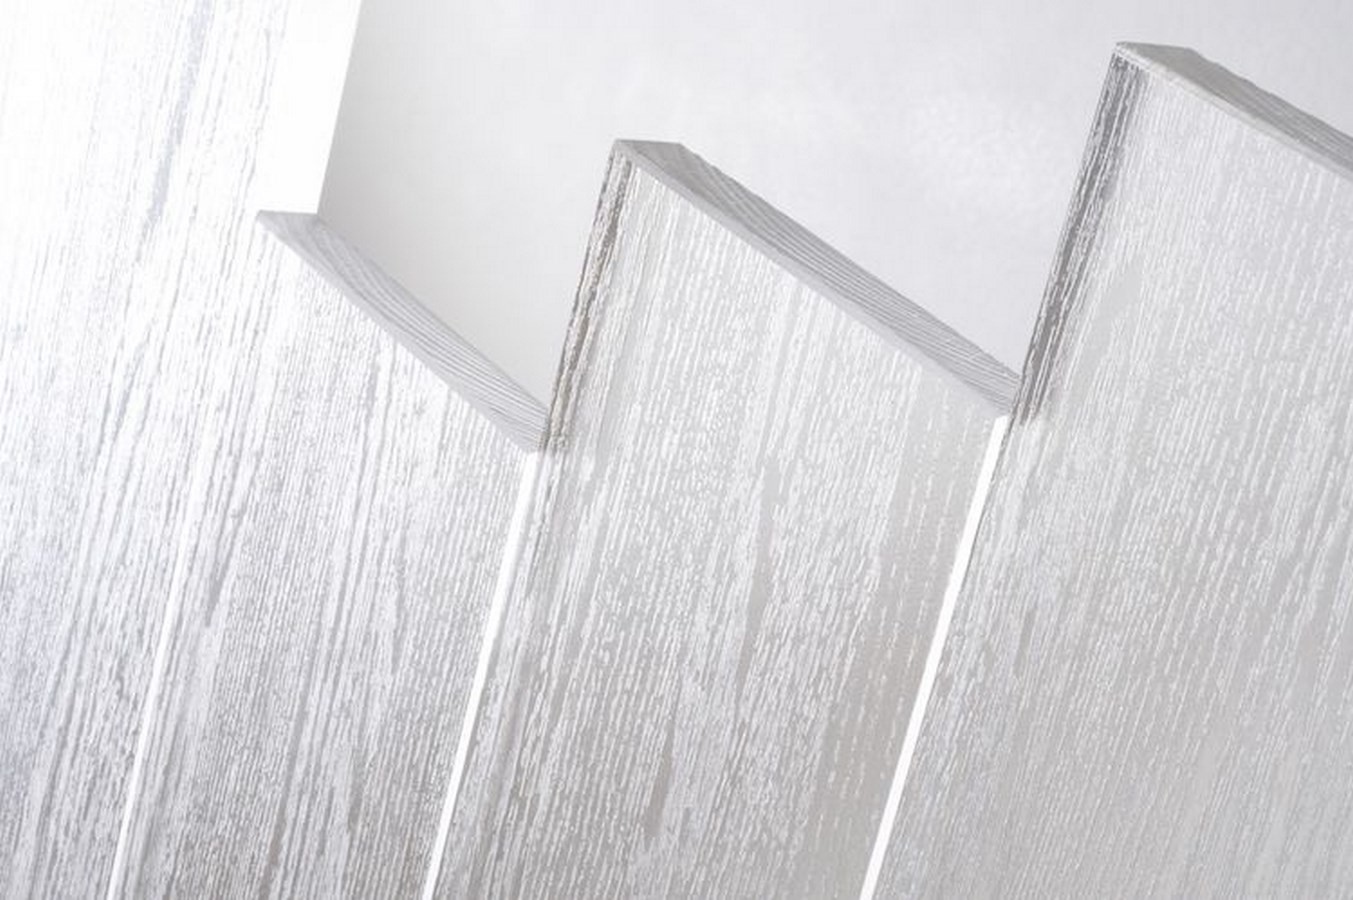 Transparent Wood- Sheet1